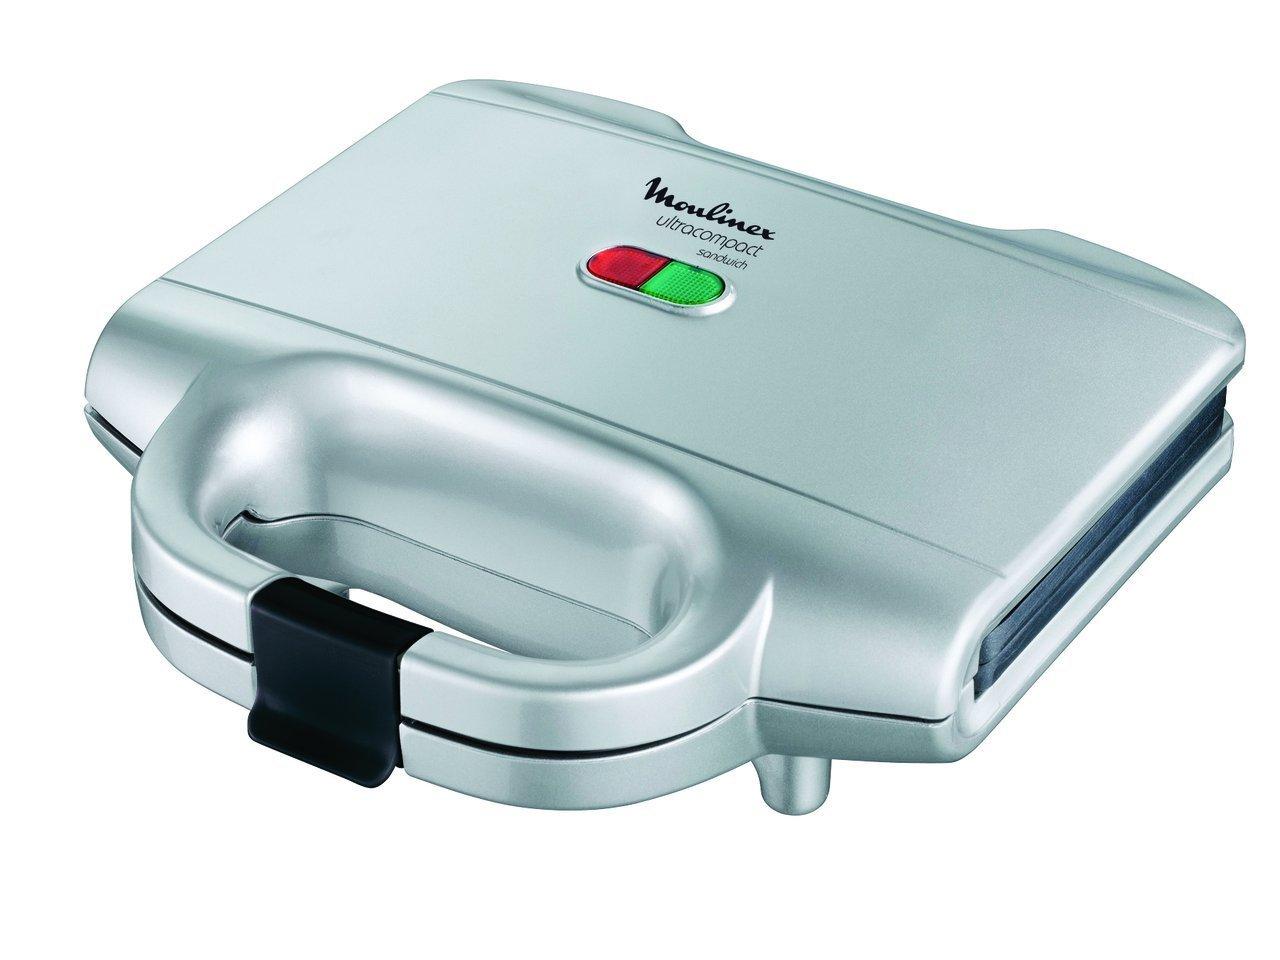 Muolinex SM1561 Piastra Elettrica Sandwich Ultracompact [Classe di efficienza energetica A] Moulinex 4725